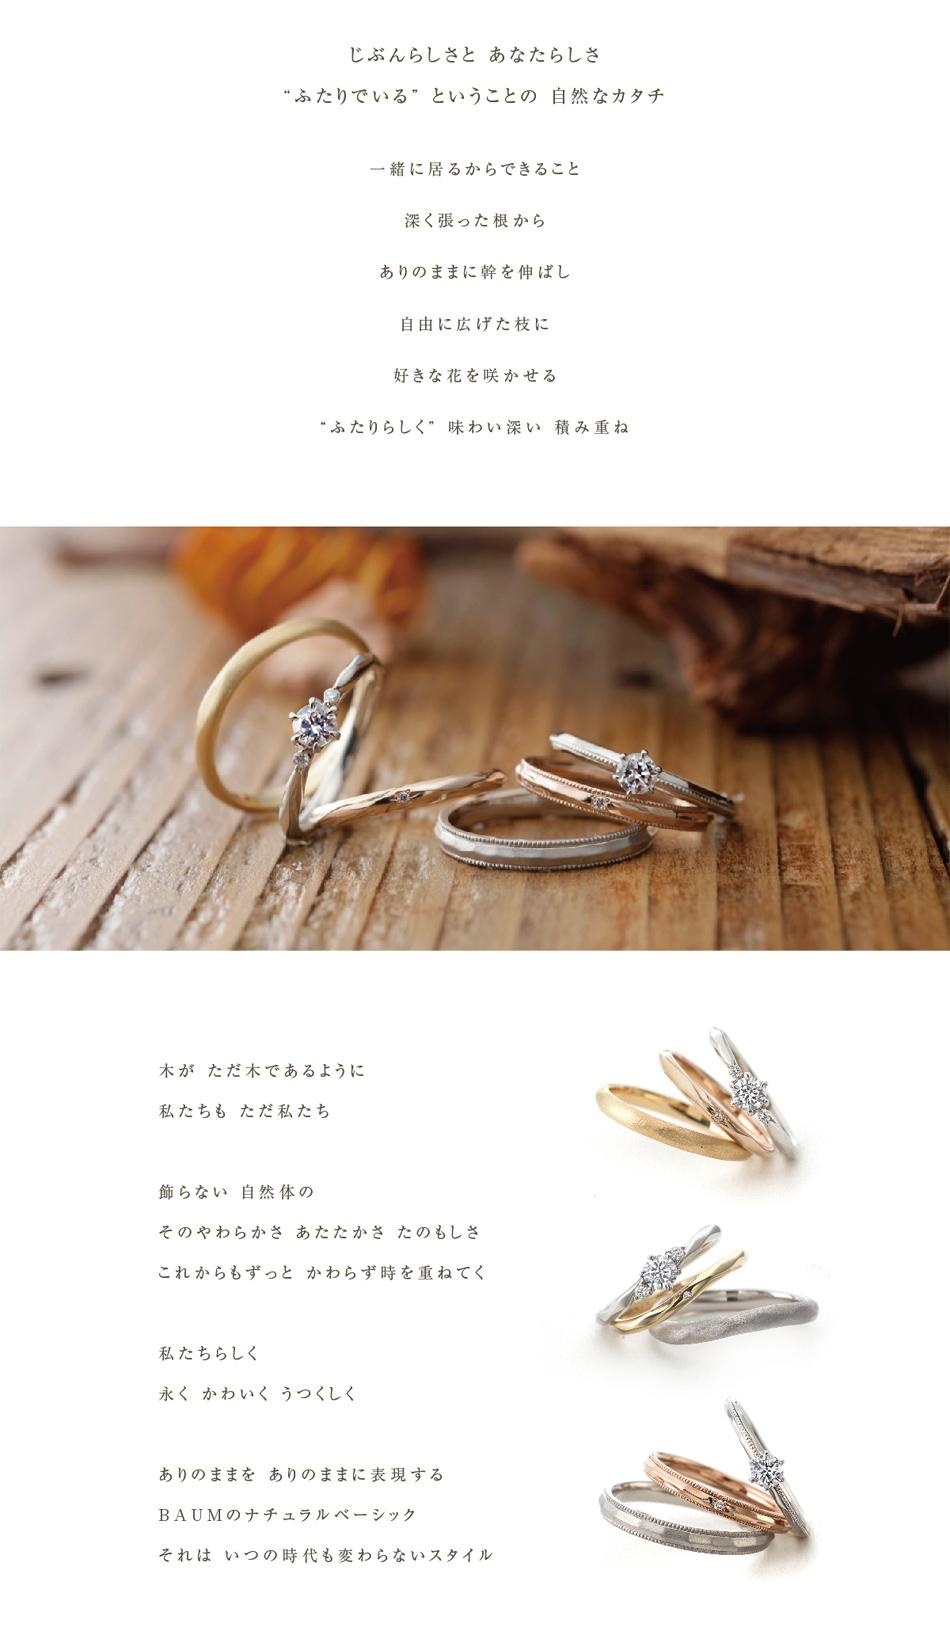 大阪 結婚指輪 BAUM